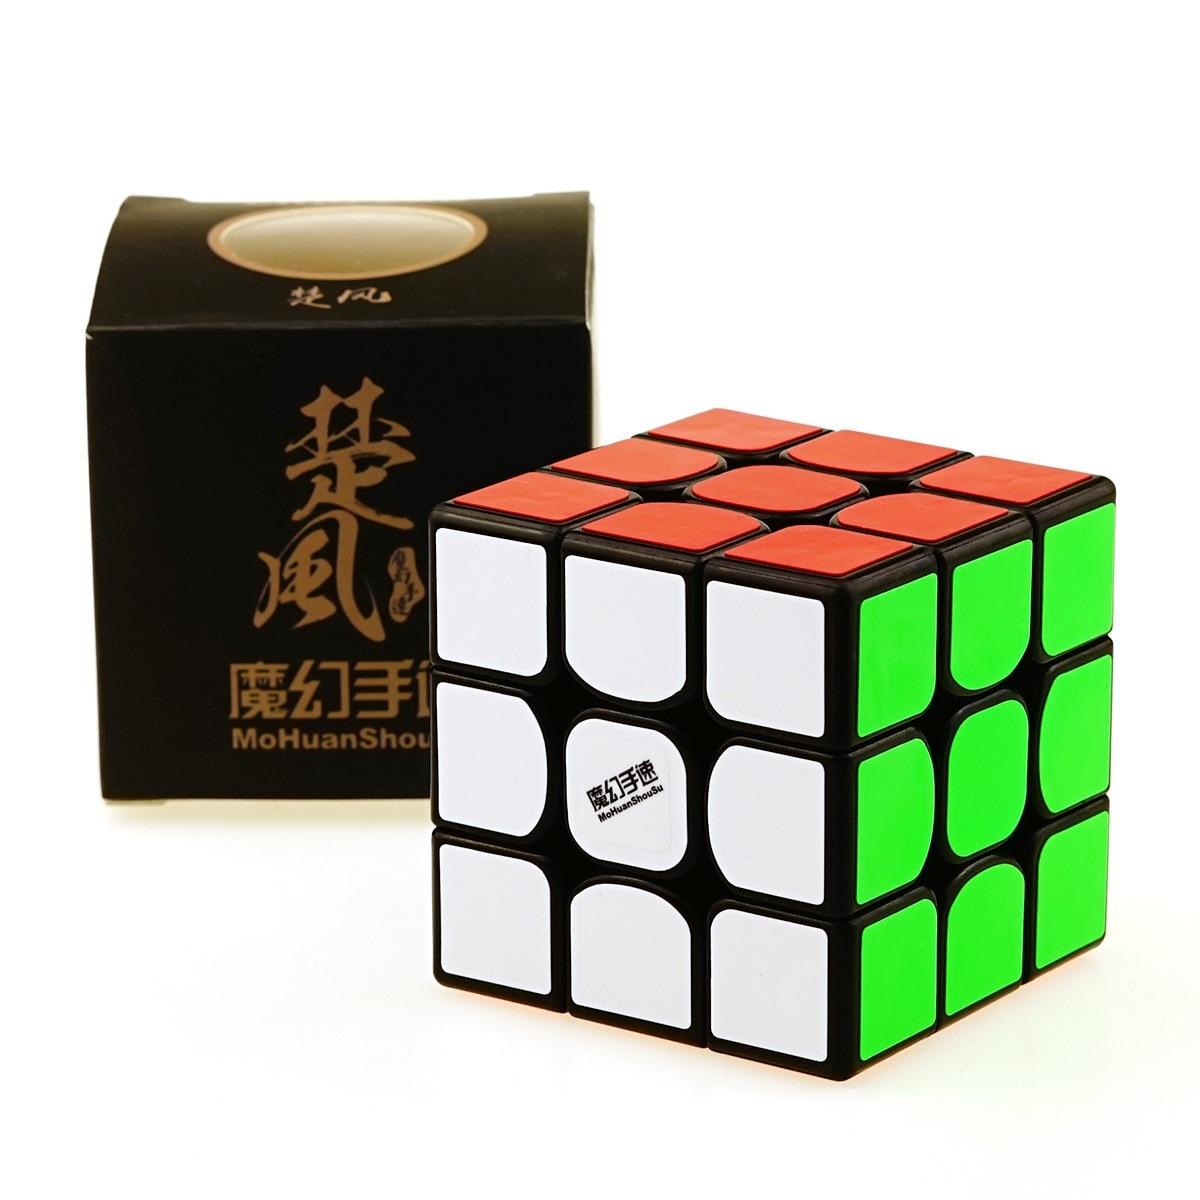 Cubos Mágicos velocidade enigma cube valk 3 Número do Pedido : 3x3x3